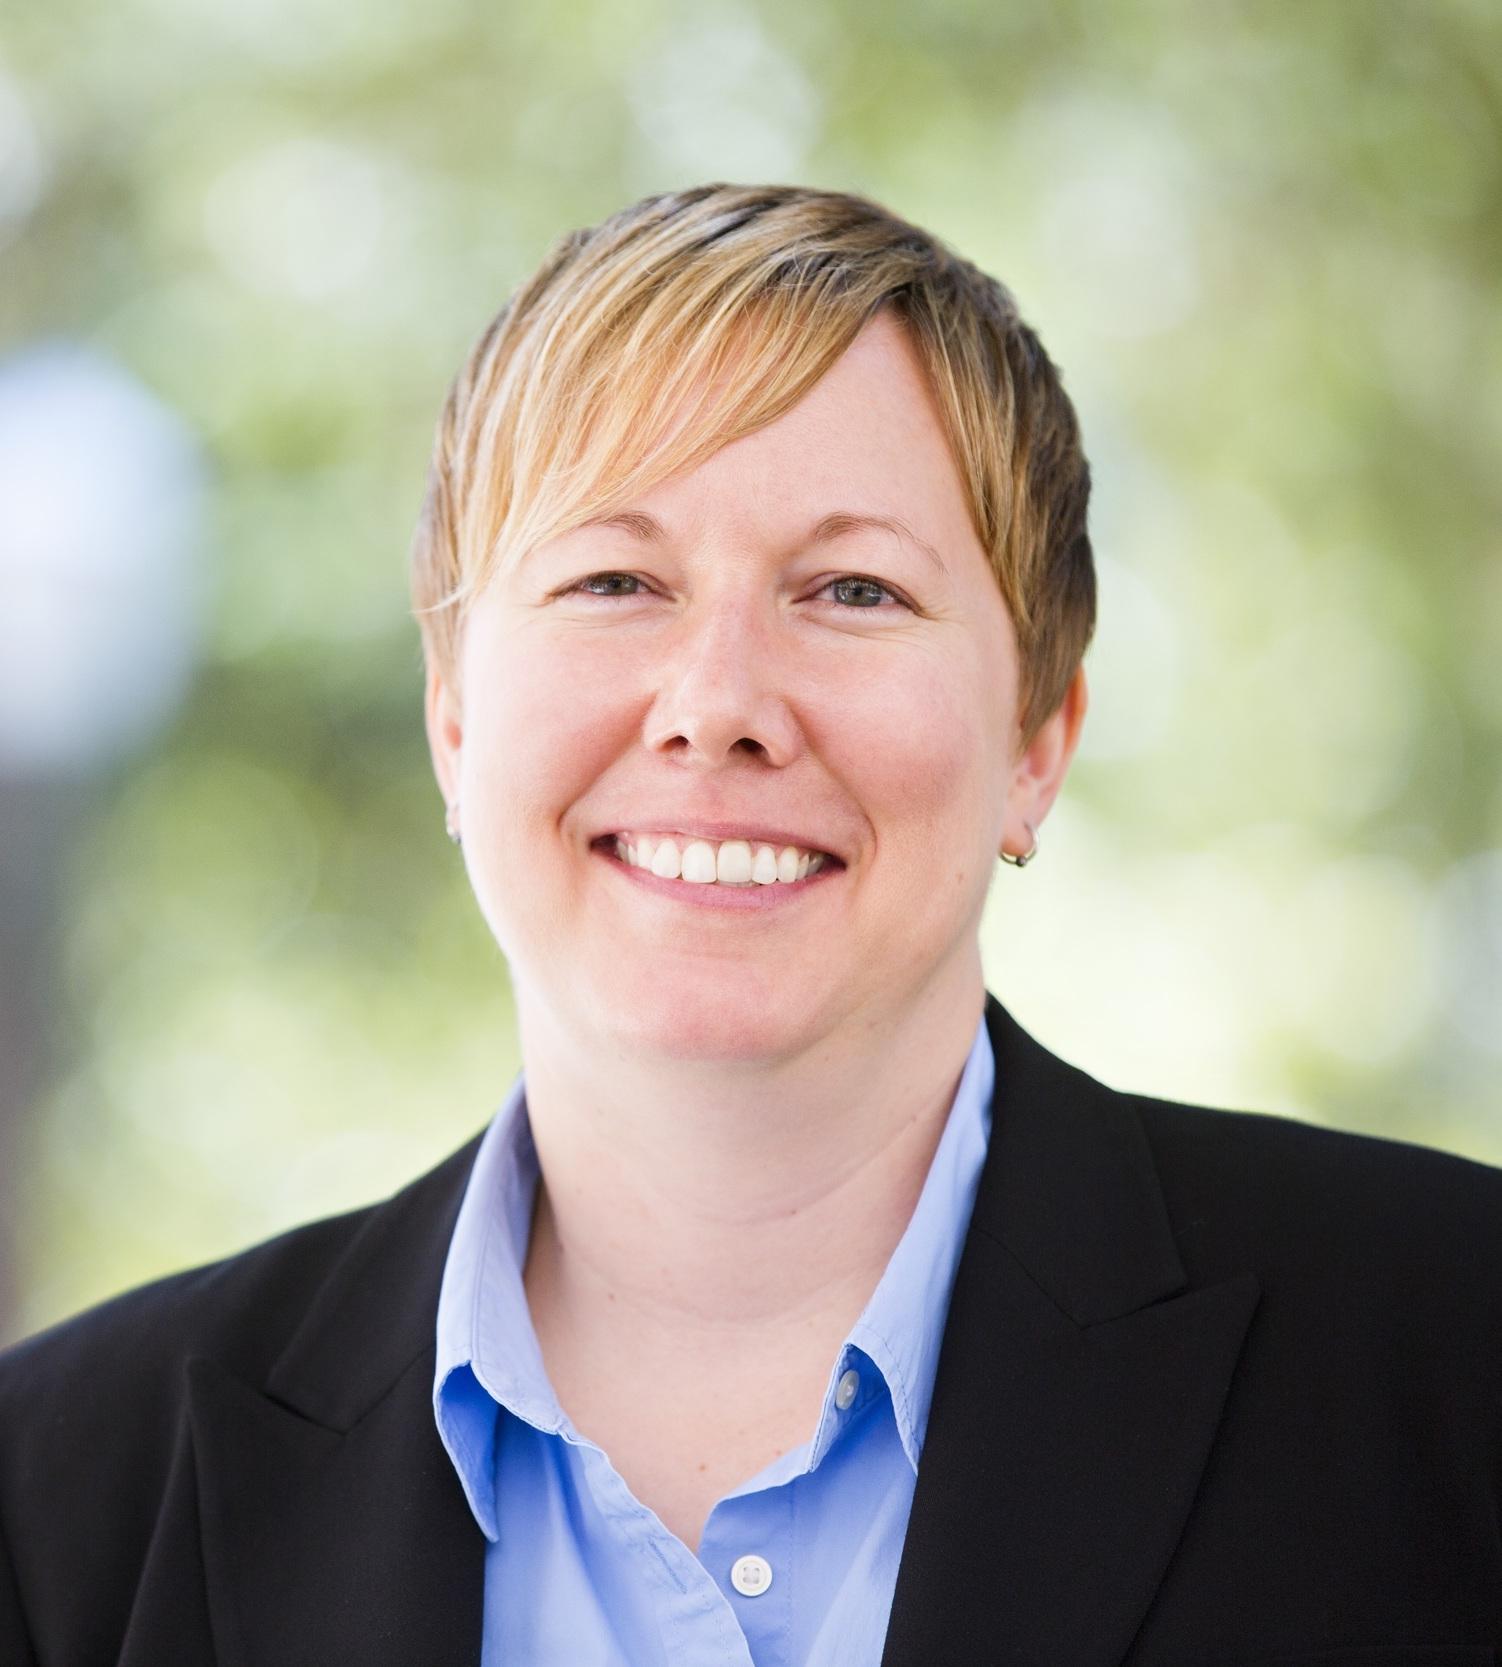 Jody L. Herman, Ph.D.     Co-Investigator   Scholar of Public Policy, Williams Institute at UCLA School of Law   University of California, Los Angeles